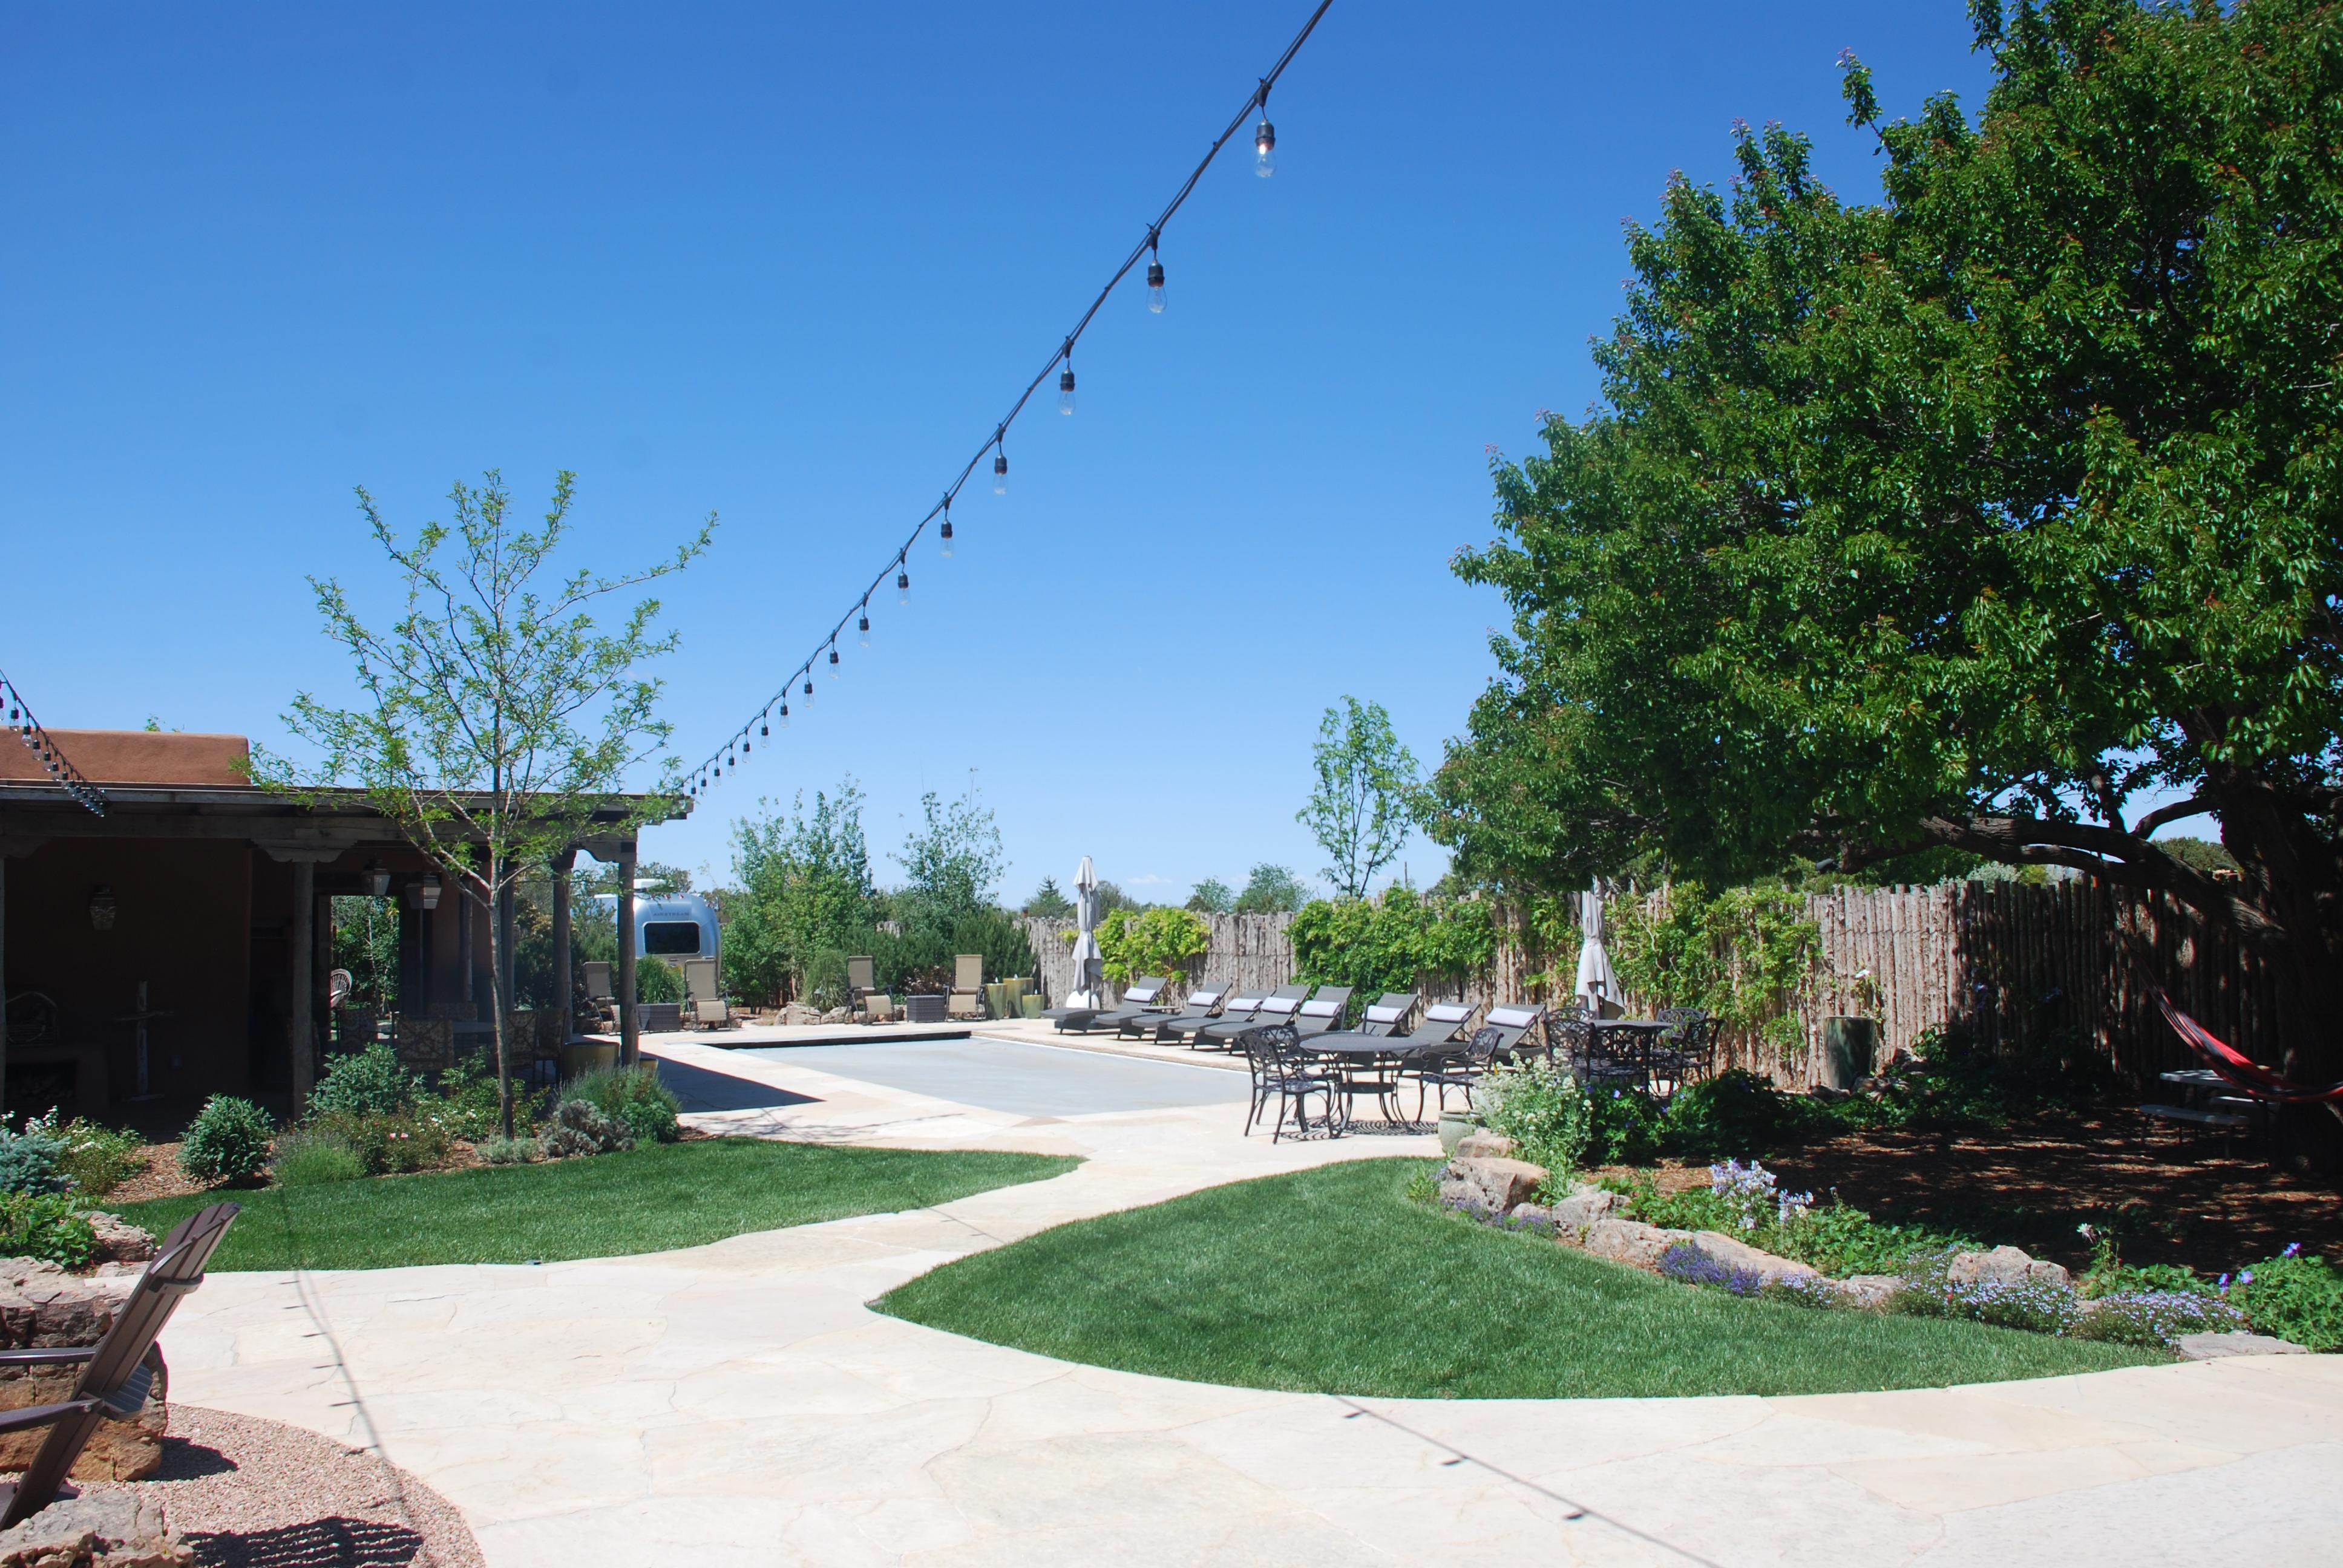 Historic Remodel - New swimming pool